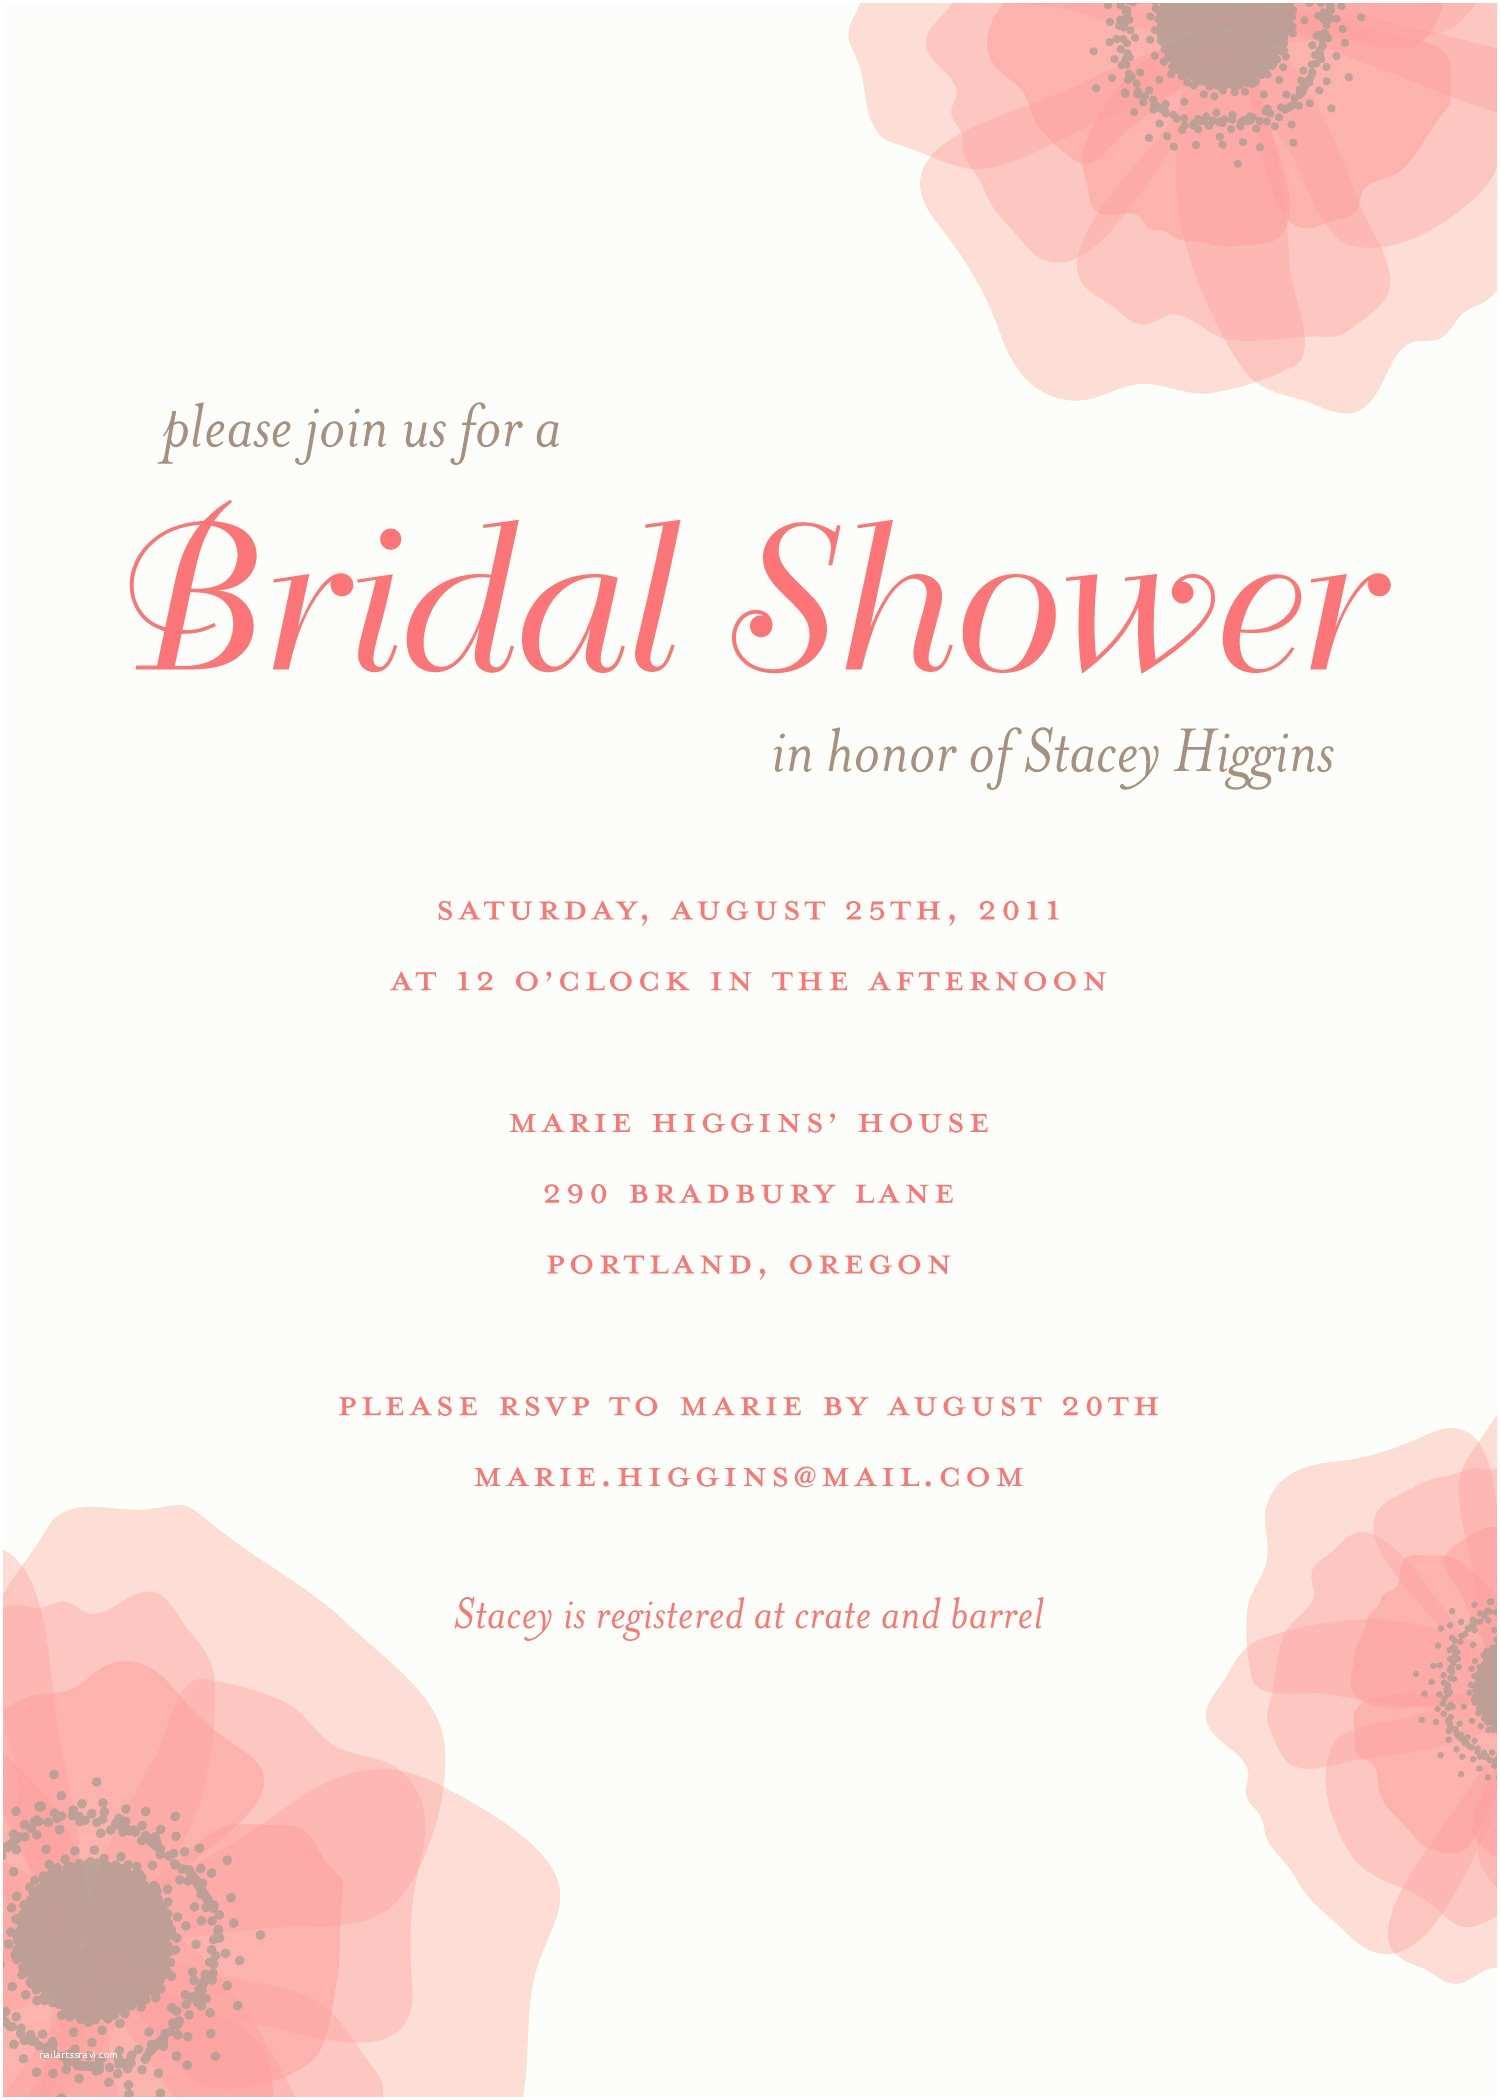 Bridal Shower Invitation Wording Bridal Shower Invitations Wedzu Image